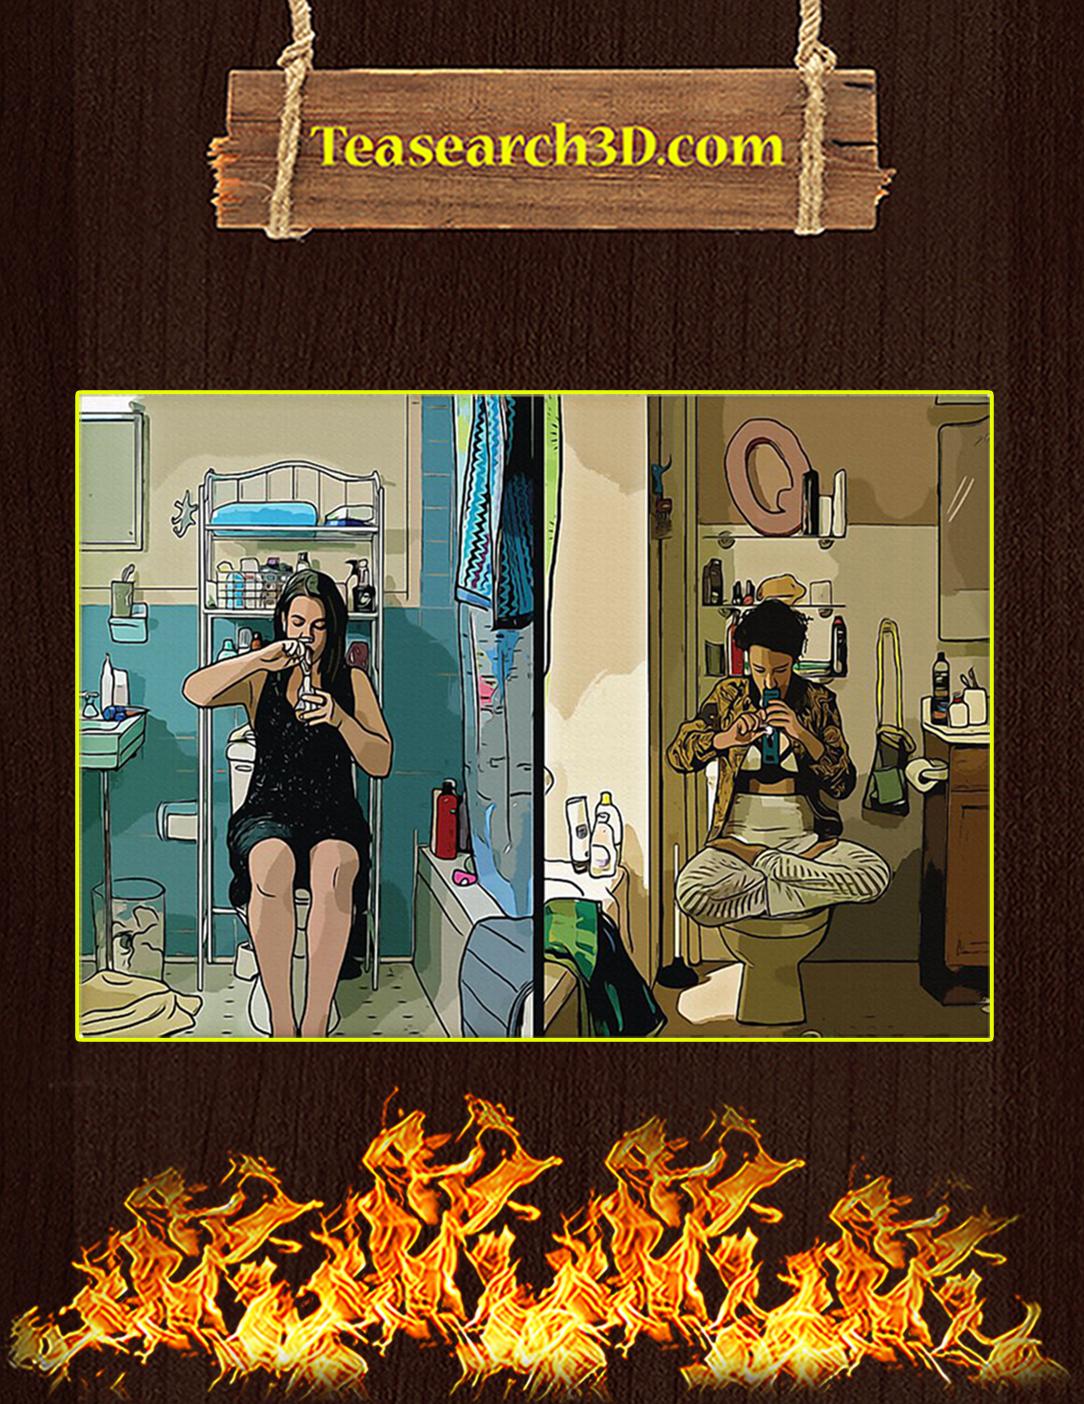 Abbi and Ilana In Bathroom Broad City Poster A2